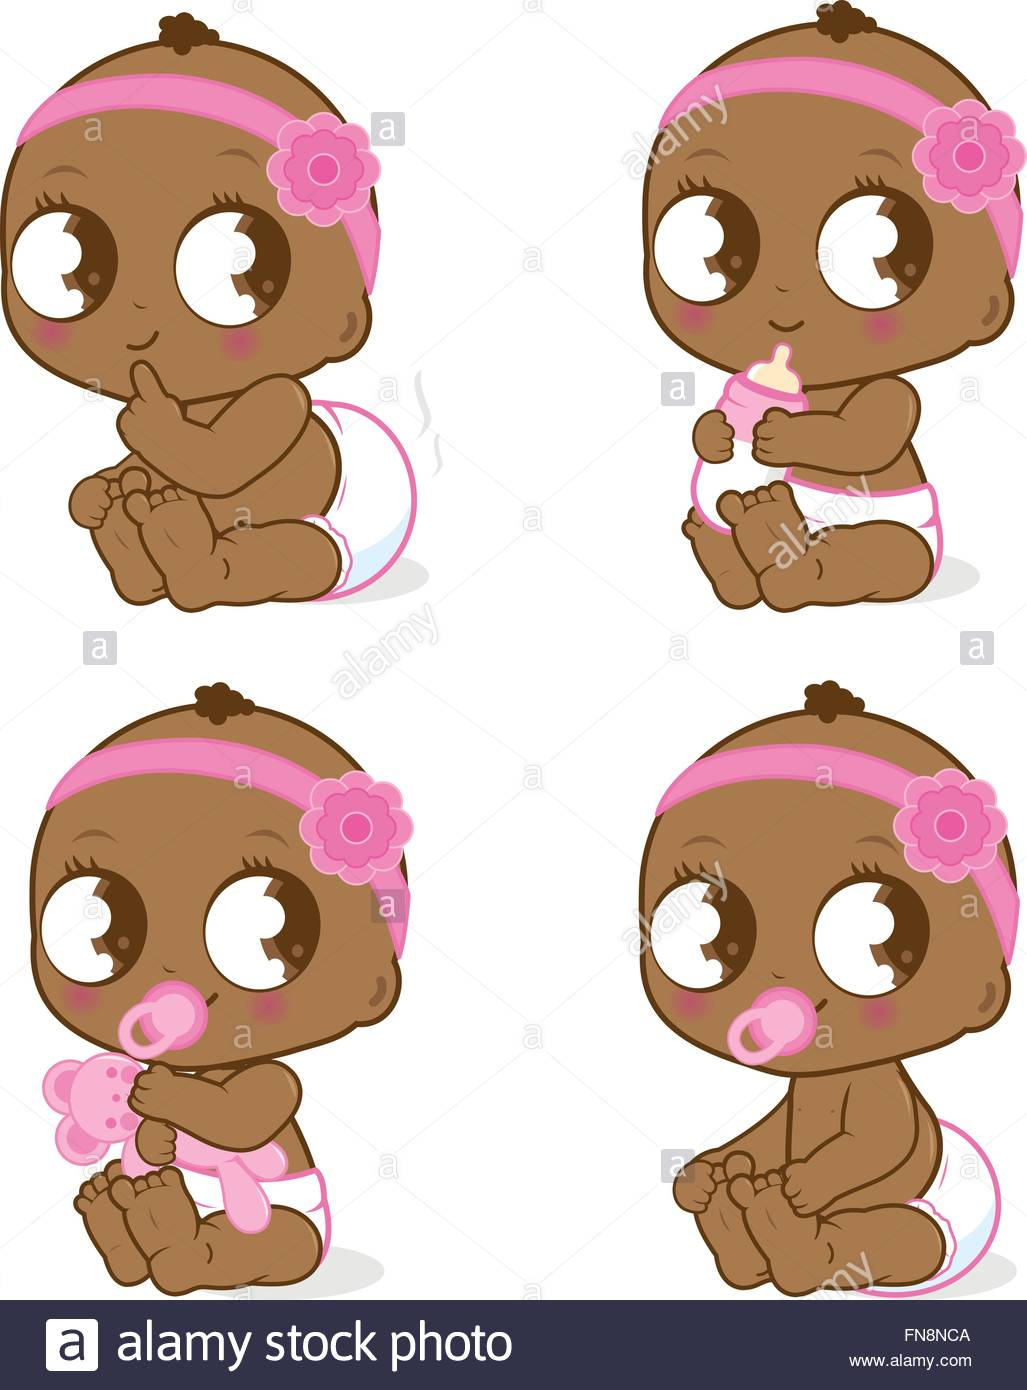 black baby drawing at getdrawings com free for personal use black rh getdrawings com black baby cartoon pics black cartoon baby boy